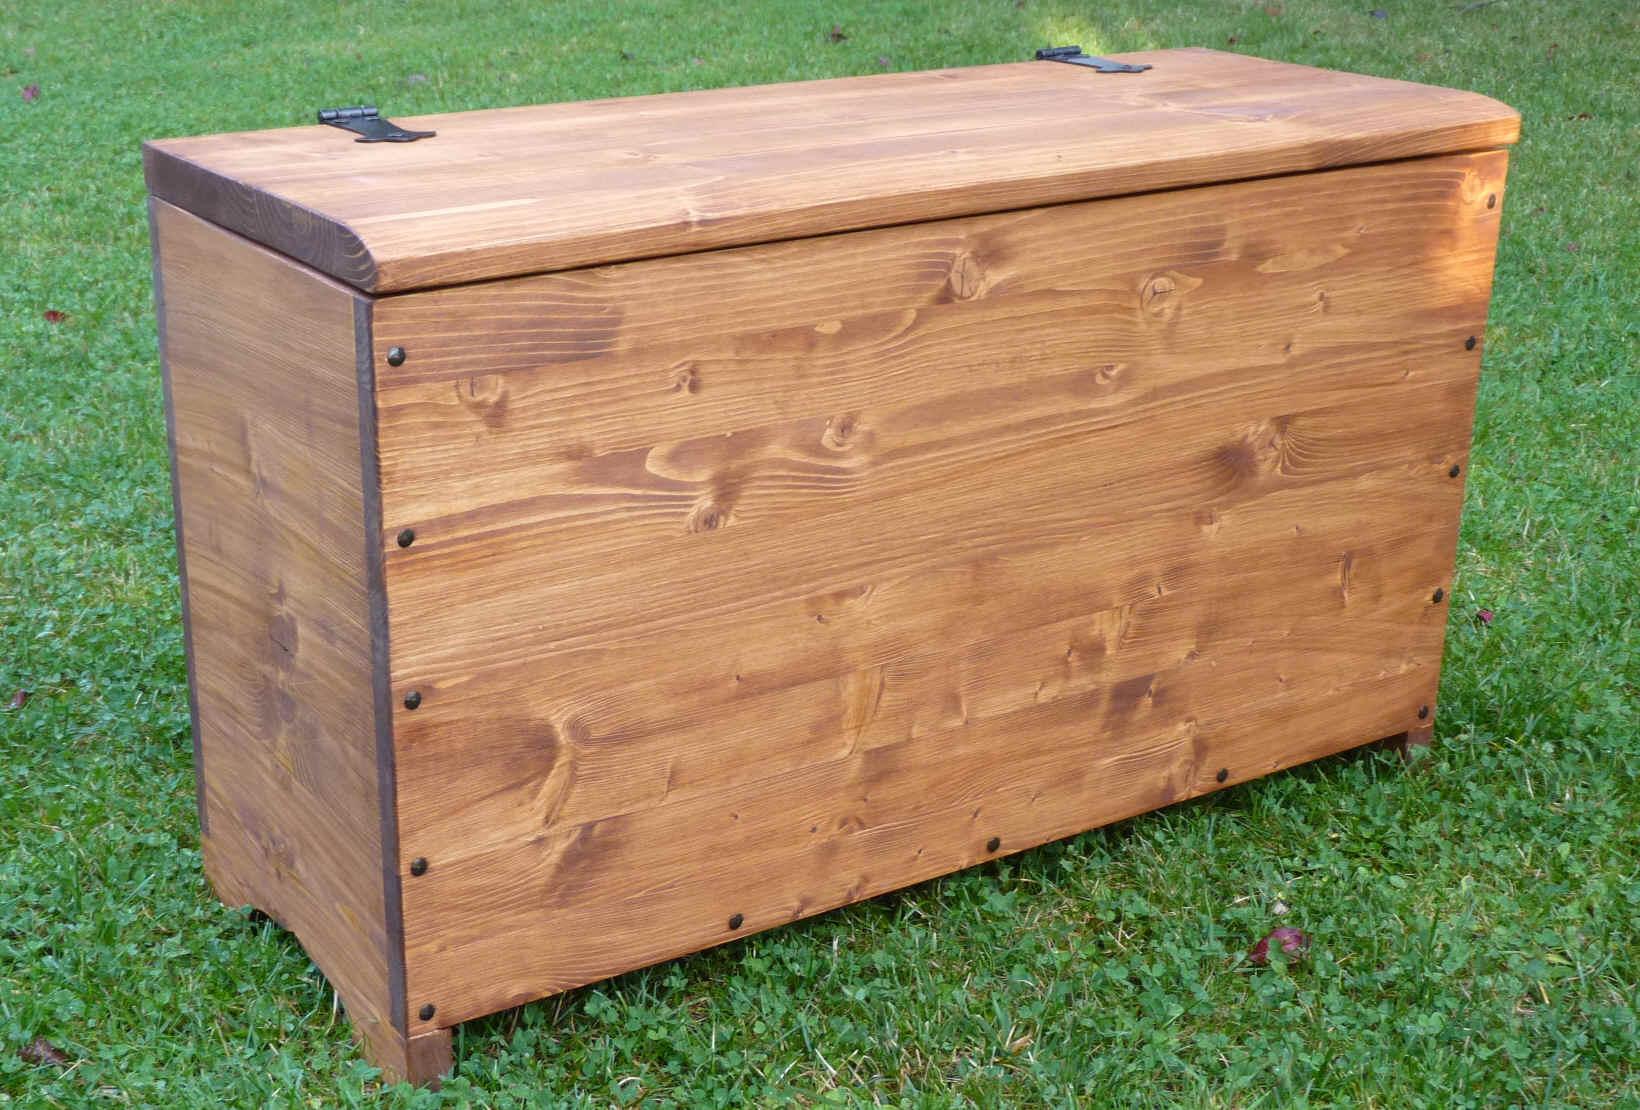 bauanleitung sitzbank mit truhe selber bauen. Black Bedroom Furniture Sets. Home Design Ideas